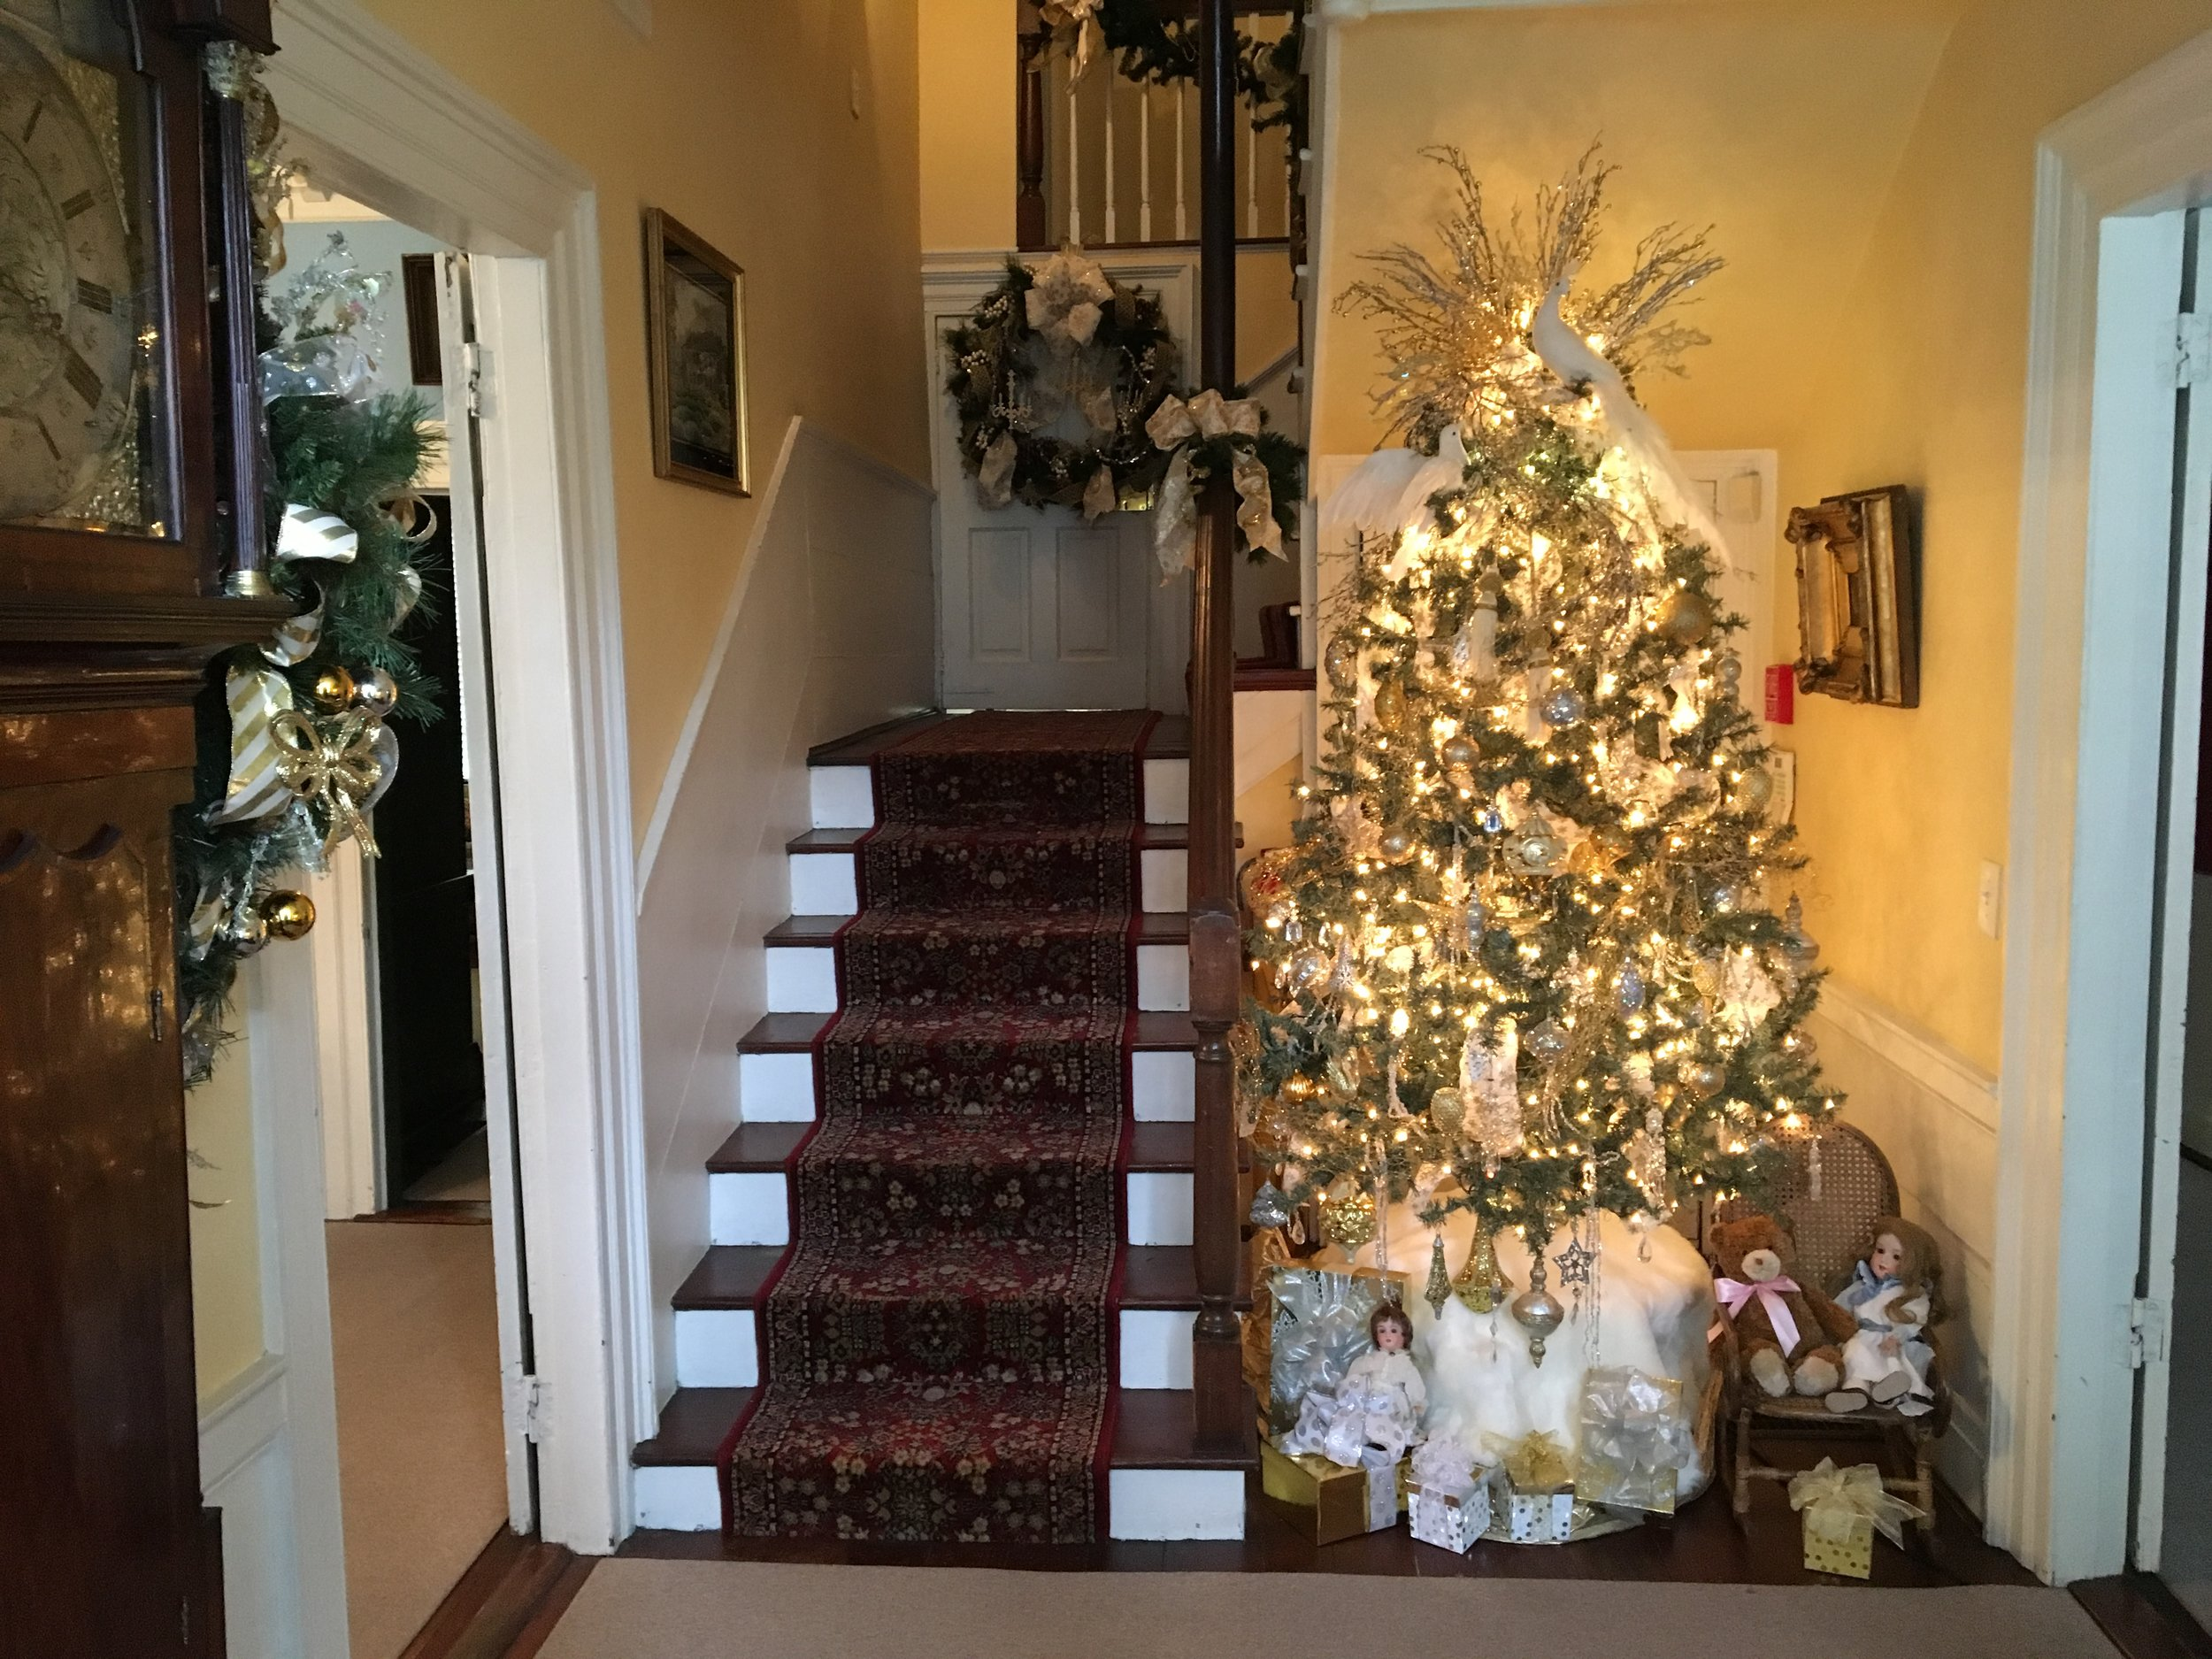 Christmas 2018 at the Kaminski House Museum